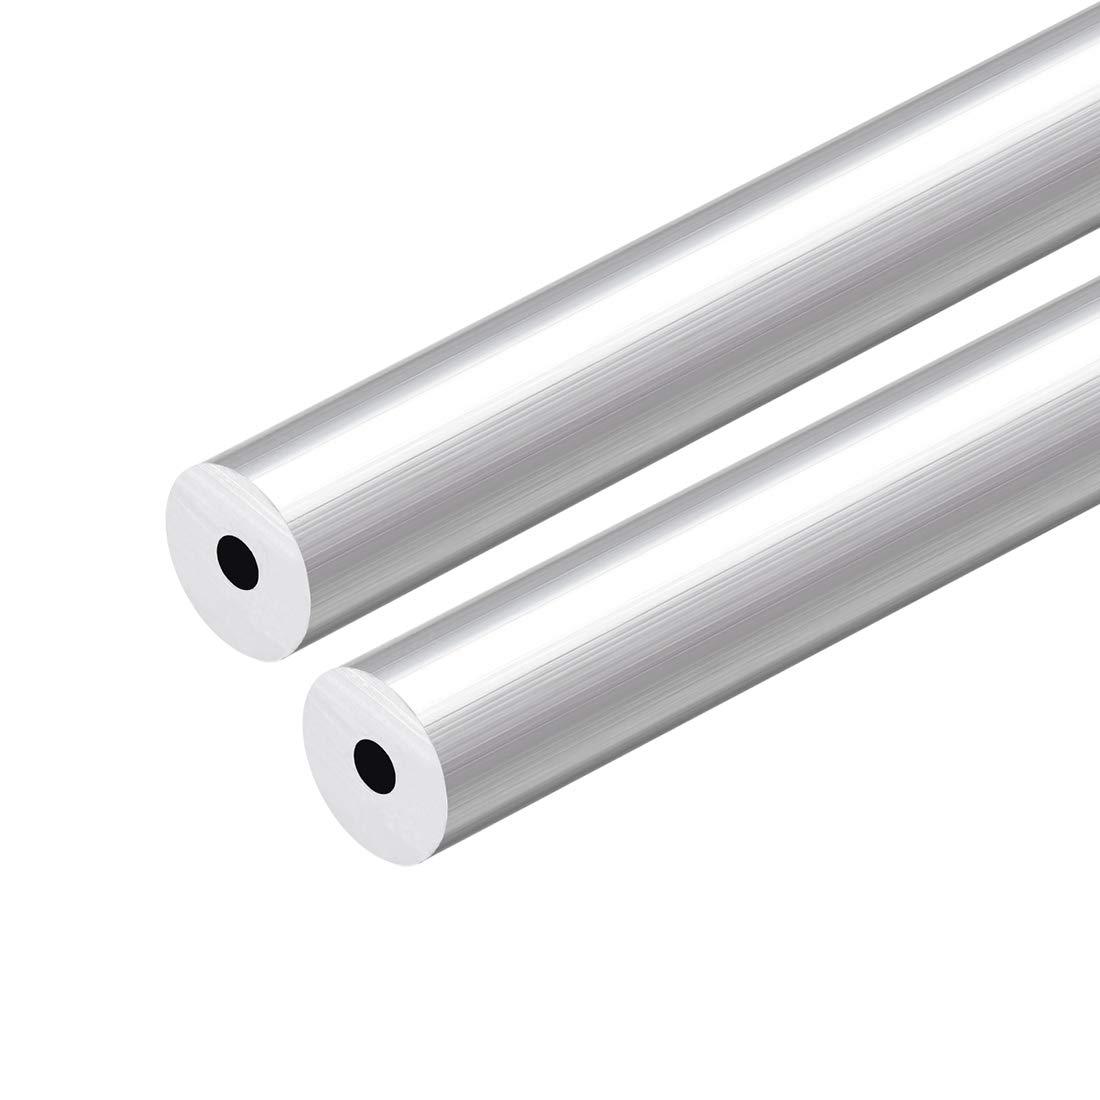 uxcell 6063 Aluminum Round Tube, 300mm Length 19mm OD 5.2mm Inner Dia Seamless Aluminum Straight Tubing 2 Pcs